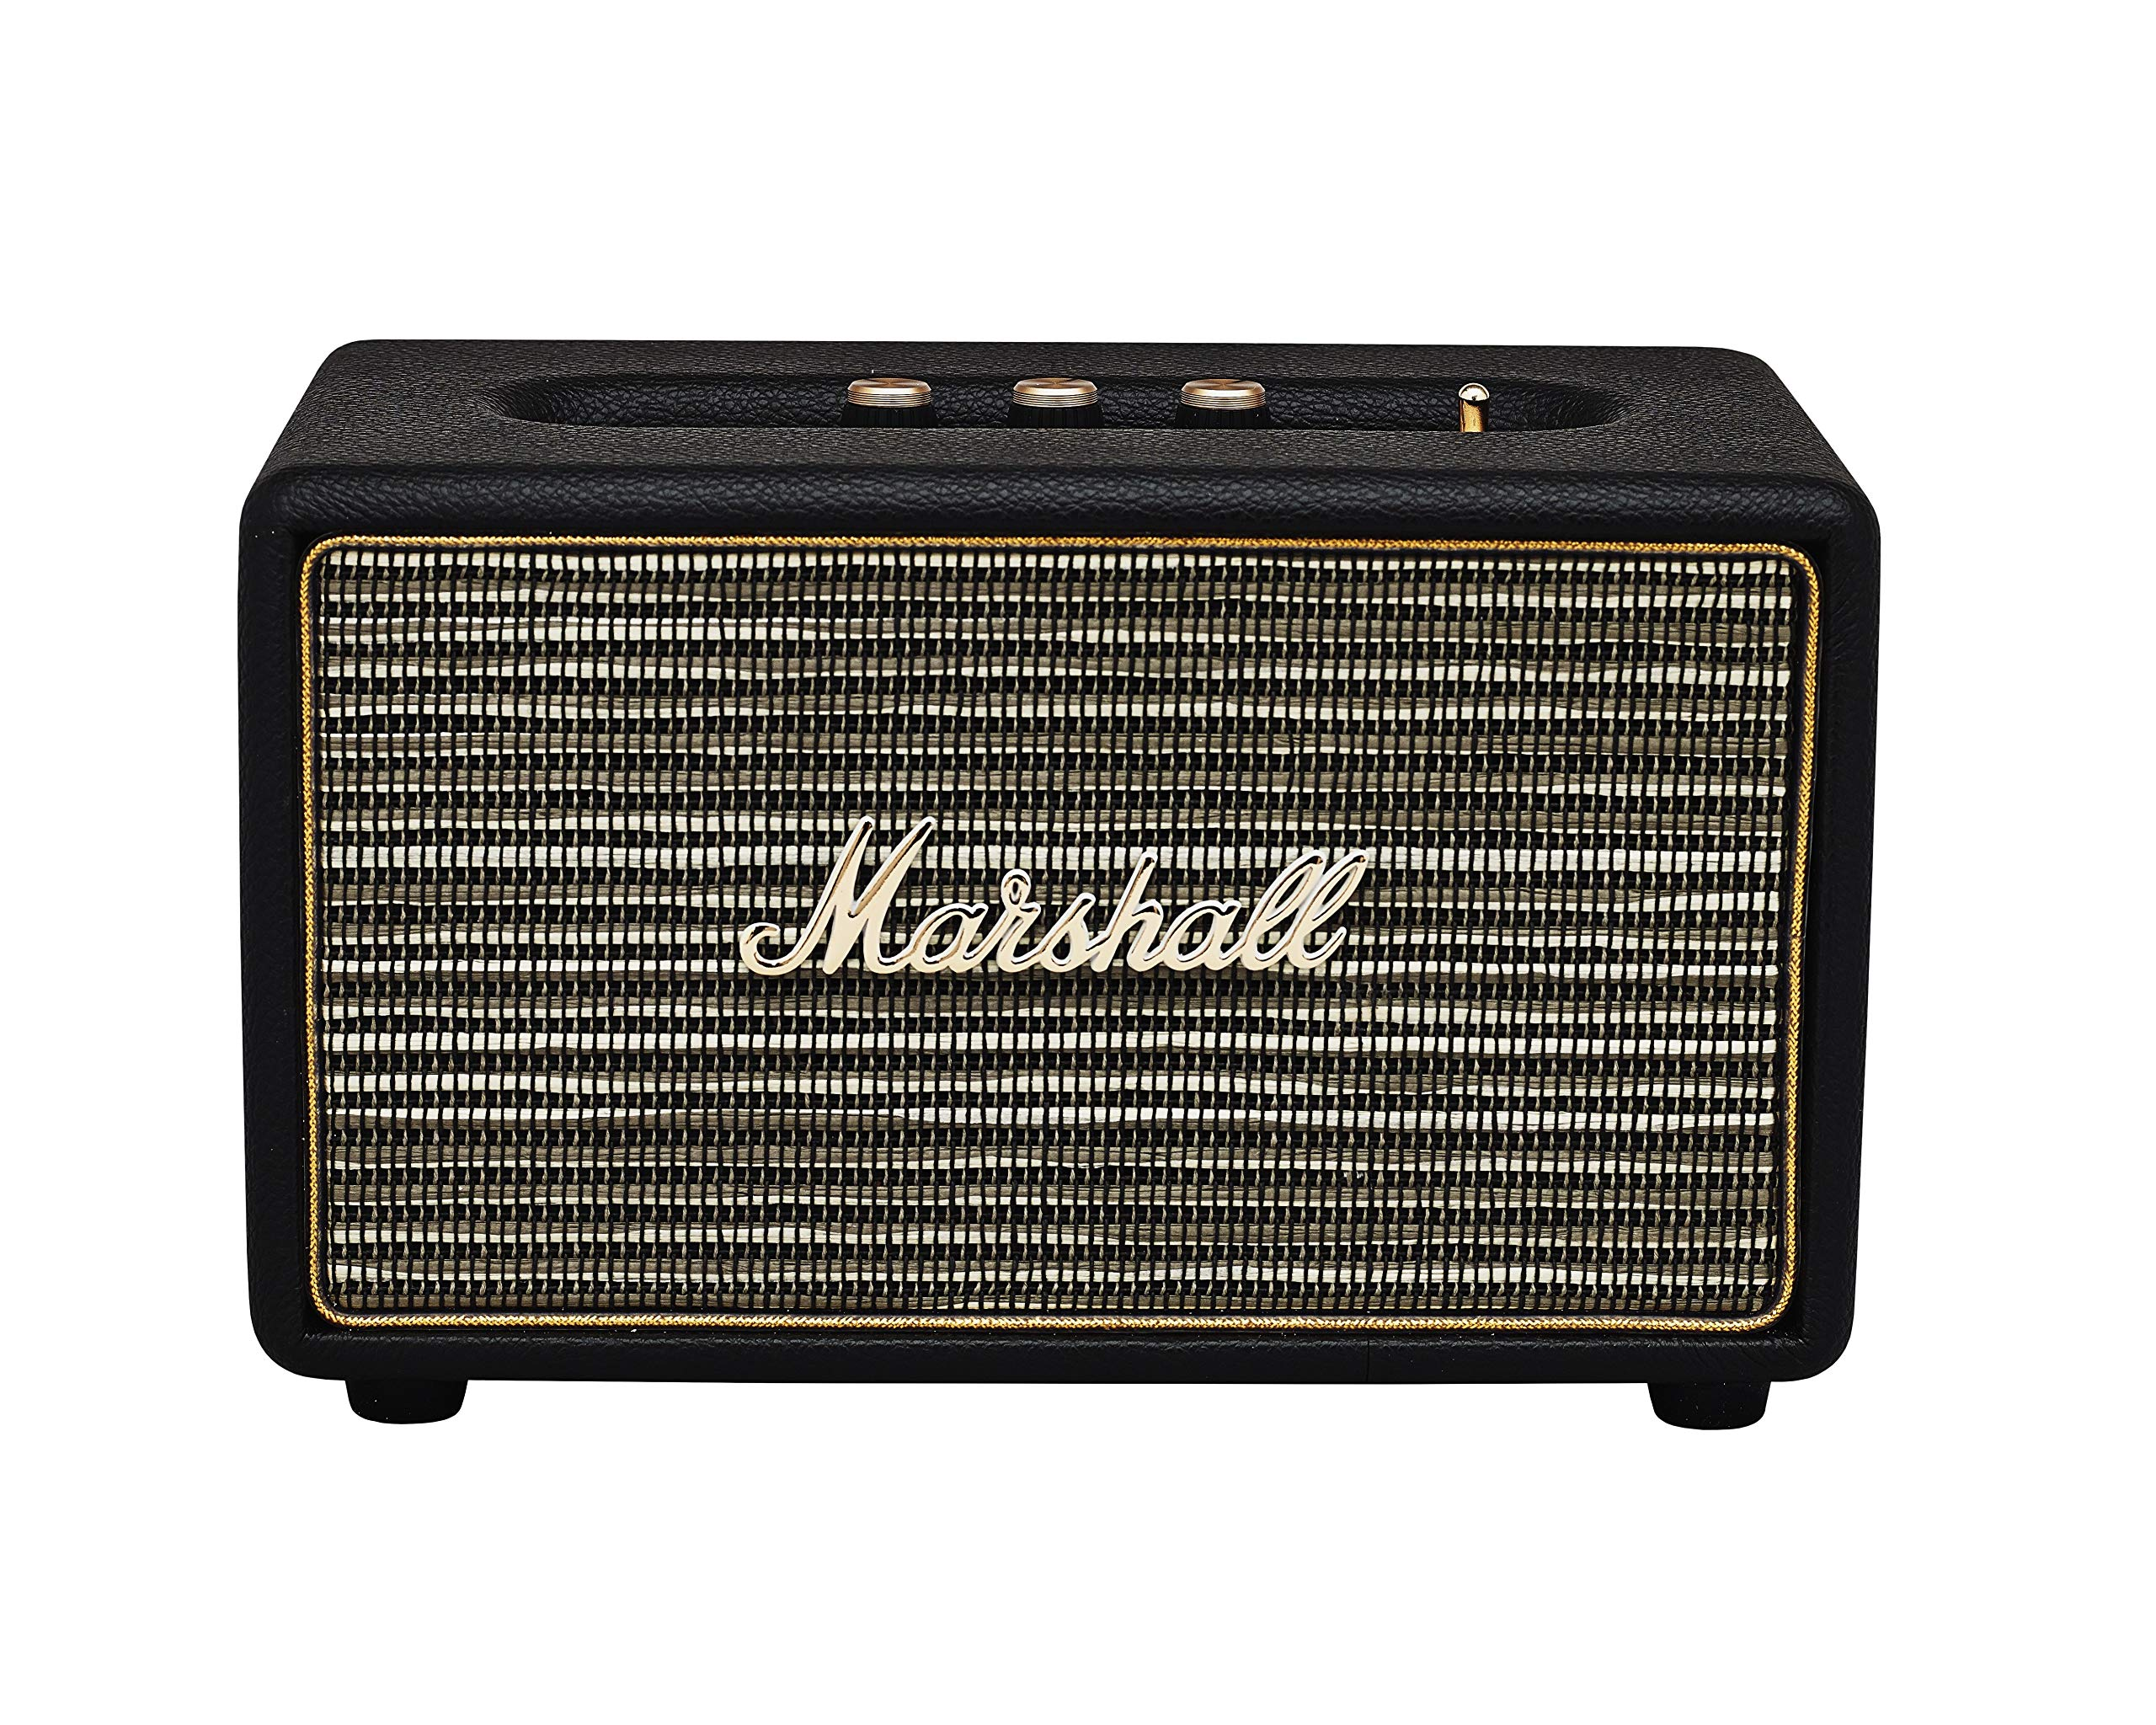 Marshall 04091802 Acton Wireless Bluetooth Speaker Black